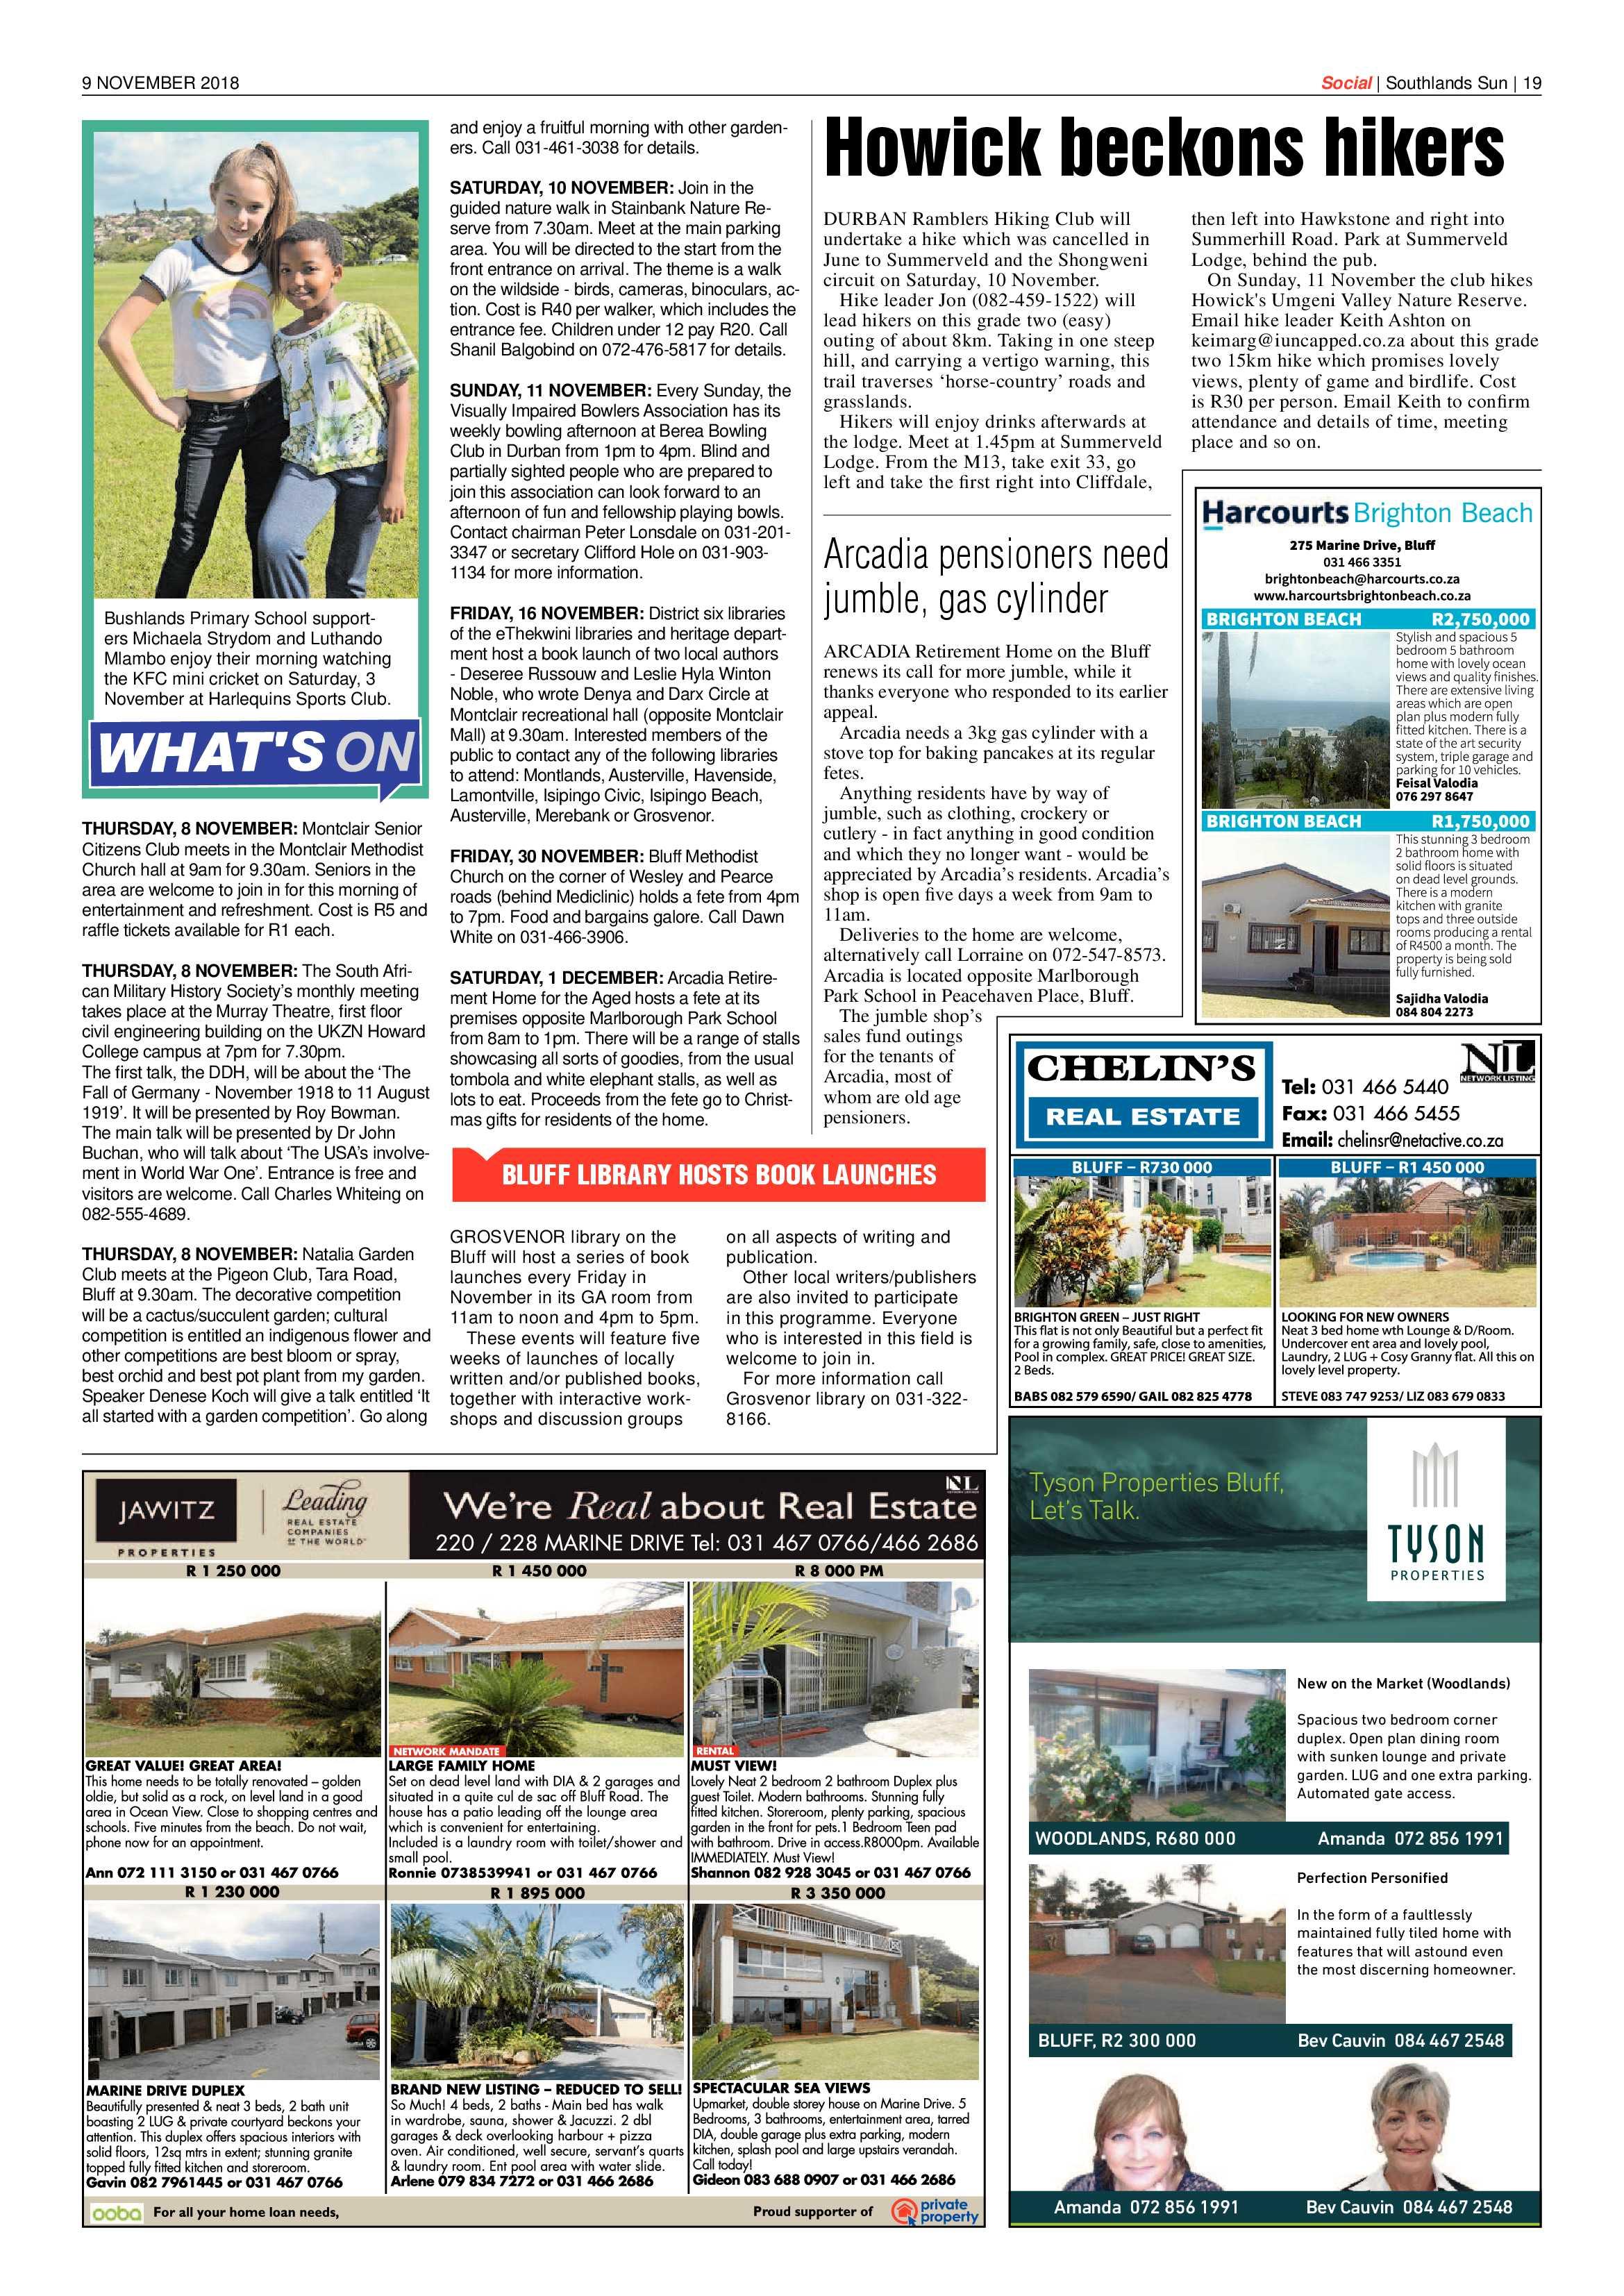 9-november-2018-epapers-page-19